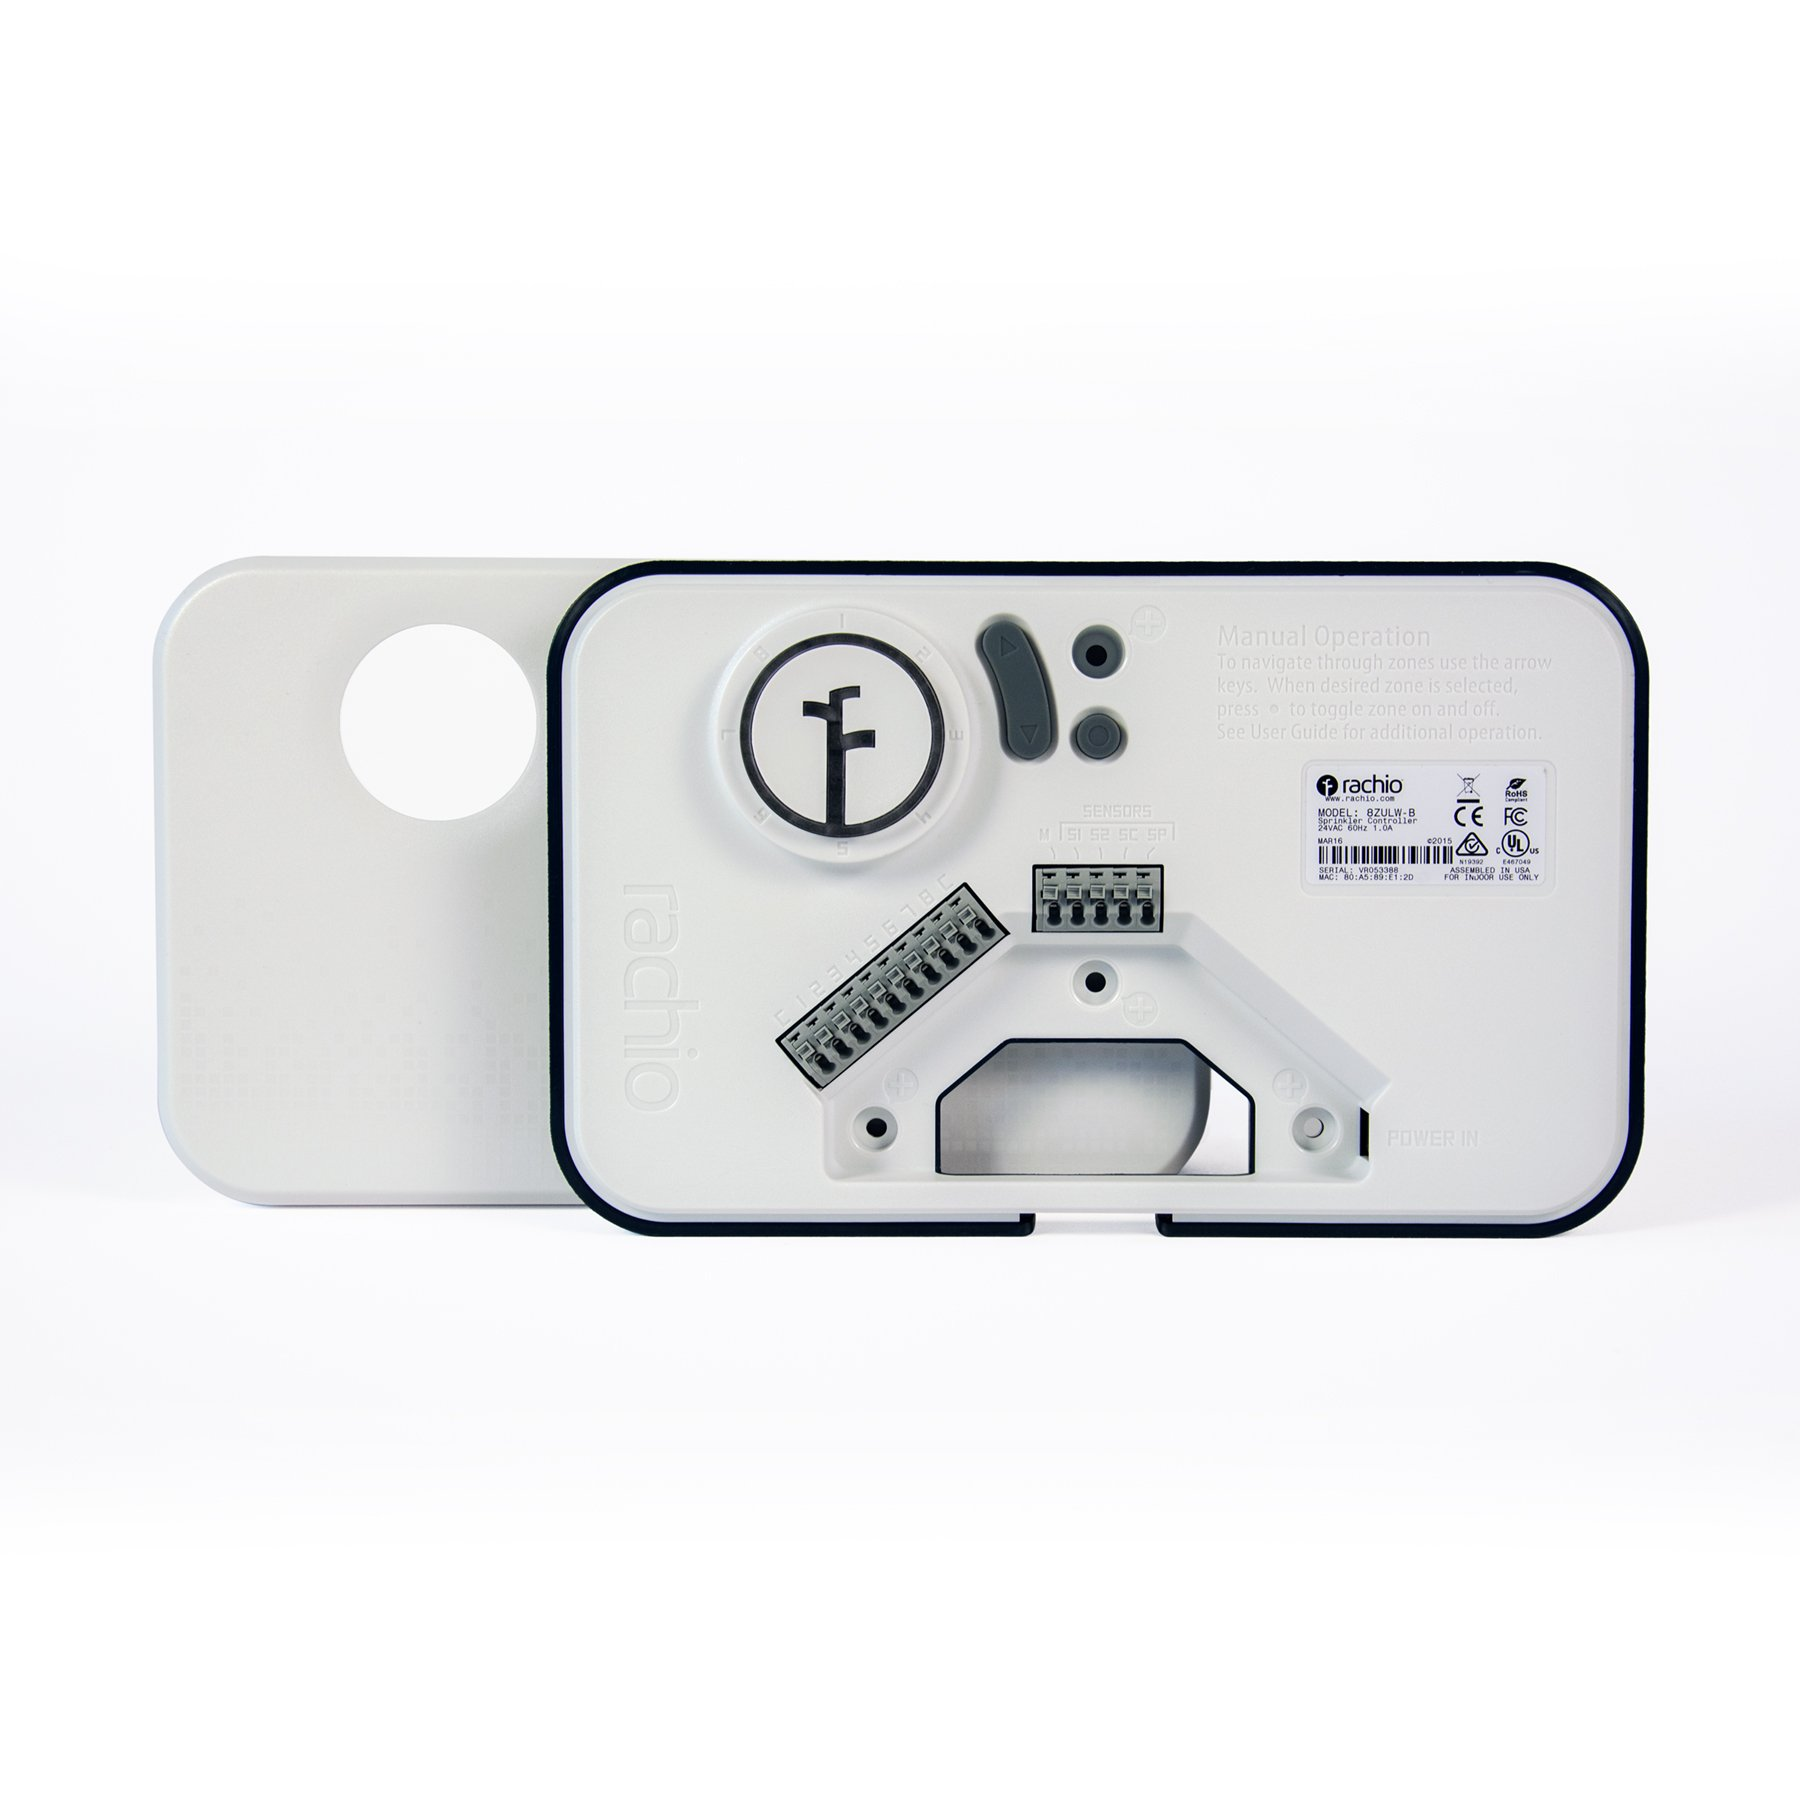 Rachio Smart Sprinkler Controller, WiFi, 8 Zone 2nd Generation, Works with Amazon Alexa by Rachio (Image #4)